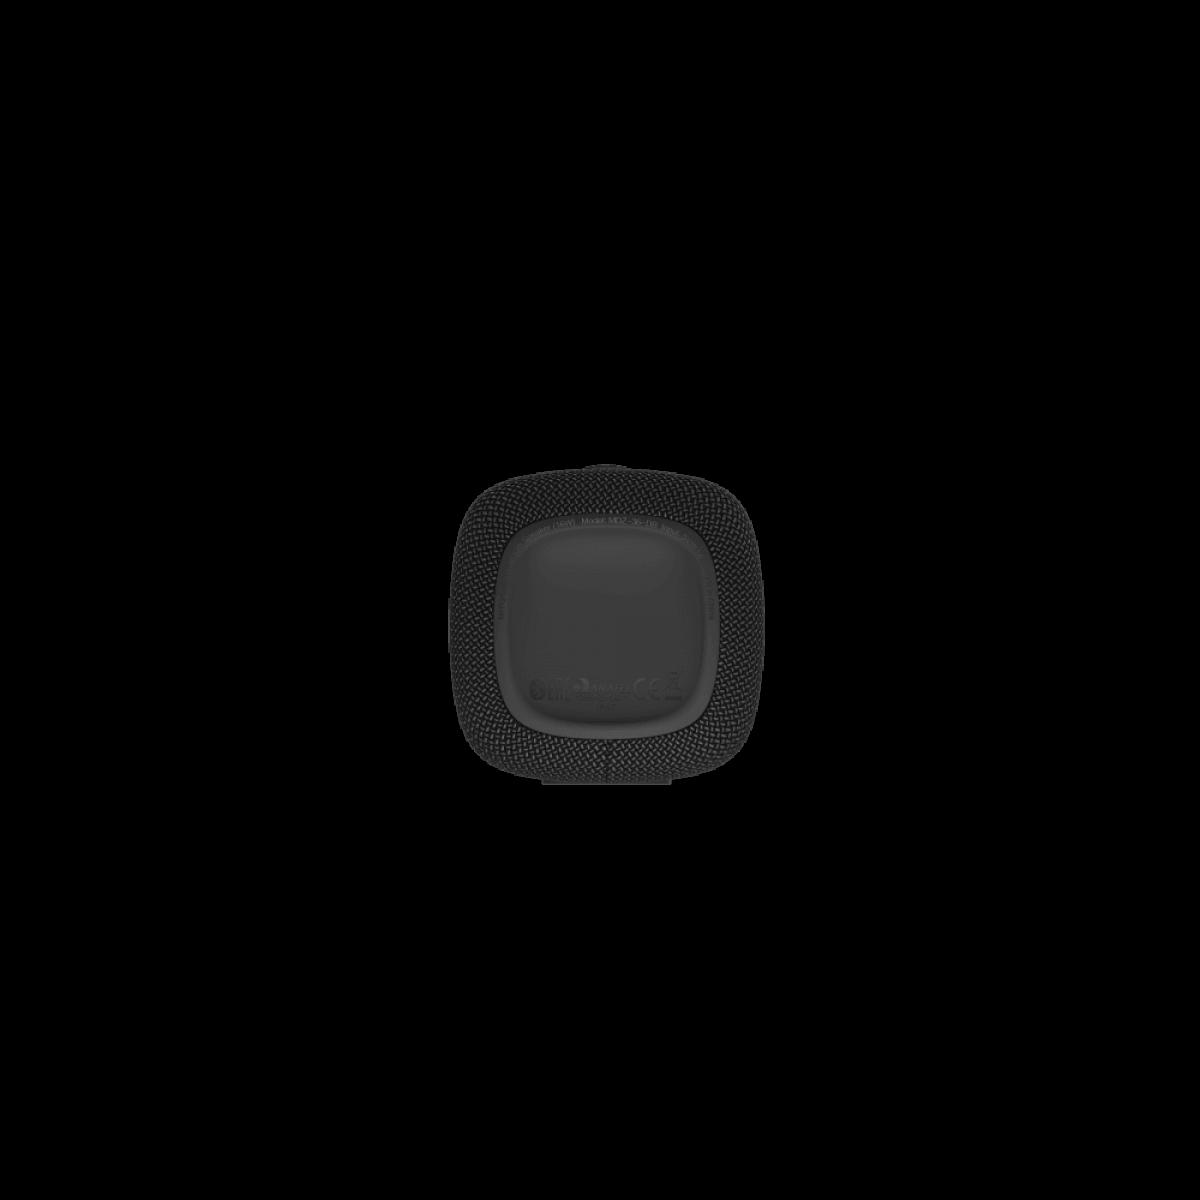 Колонки Xiaomi Колонка портативная Mi Portable Bluetooth Speaker Black (16W)